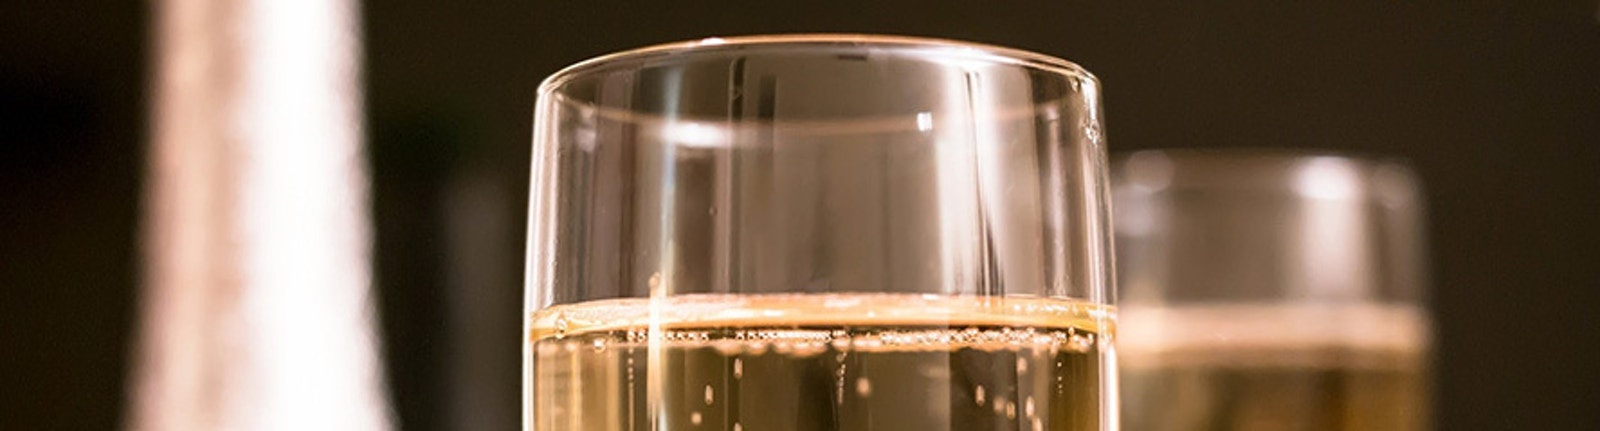 Champagne 1110591 1920 Blog